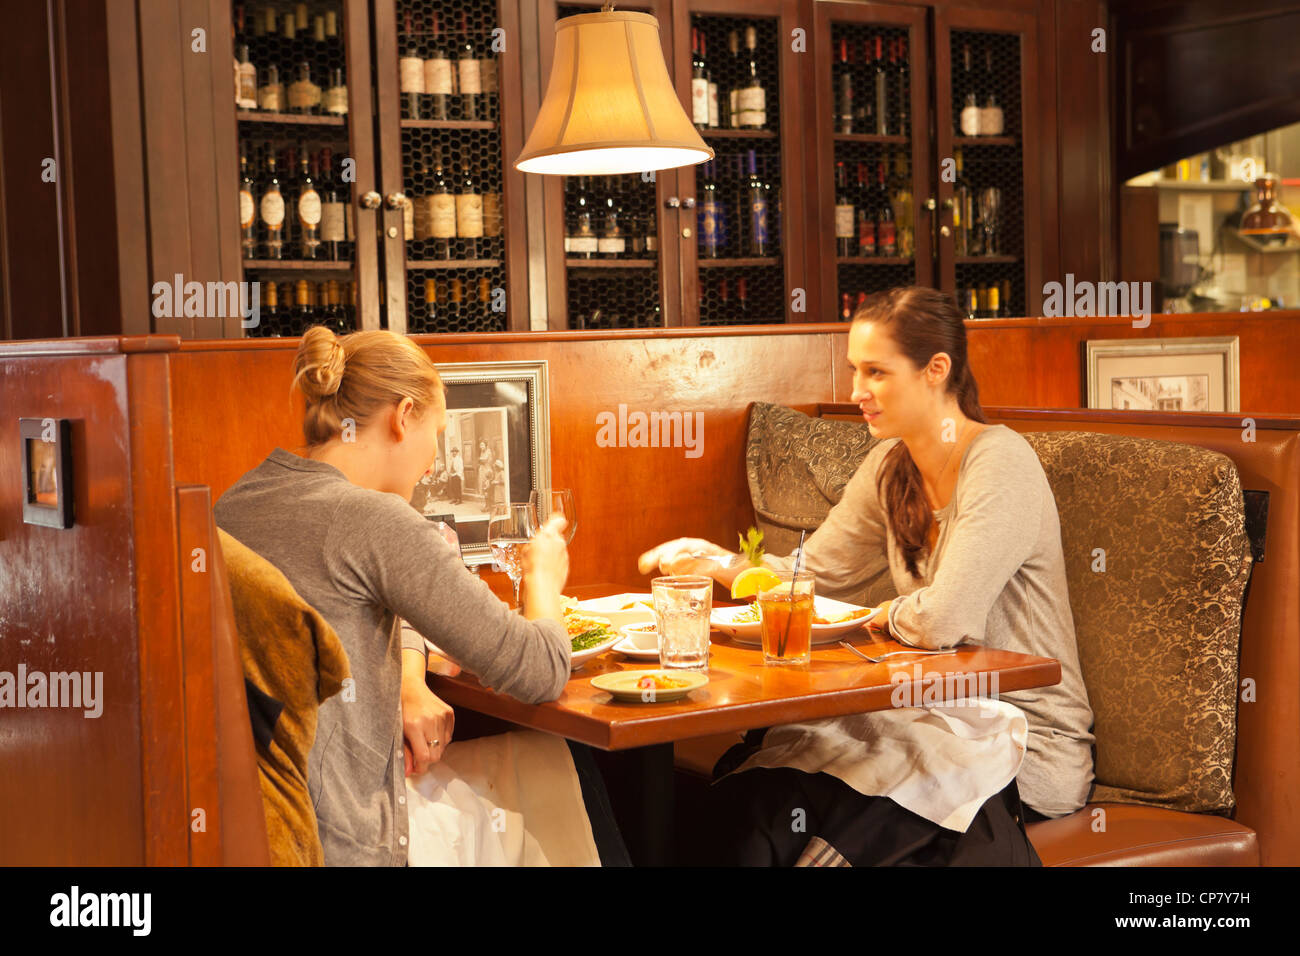 Cafe Fiore Ventura California Stock Photo 48118213 Alamy